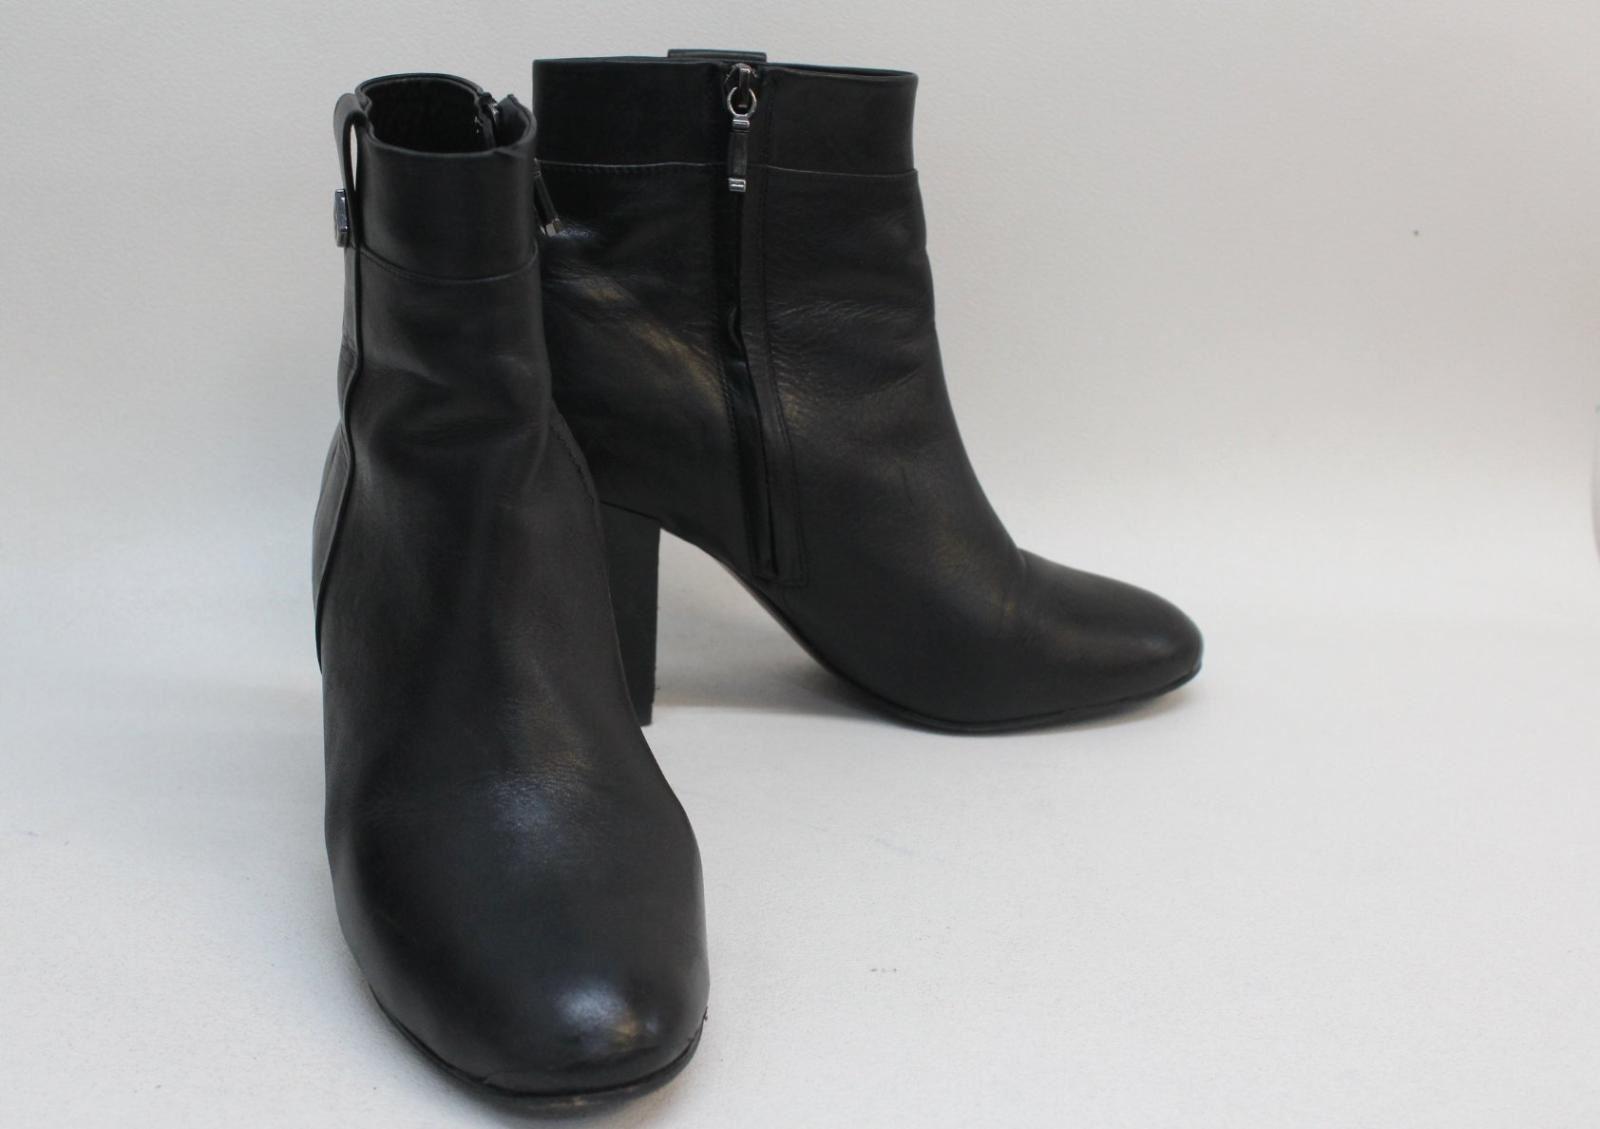 MASSIMO DUTTI Ladies Black Leather Round Toe Side Zip Ankle Boots UK7 EU40